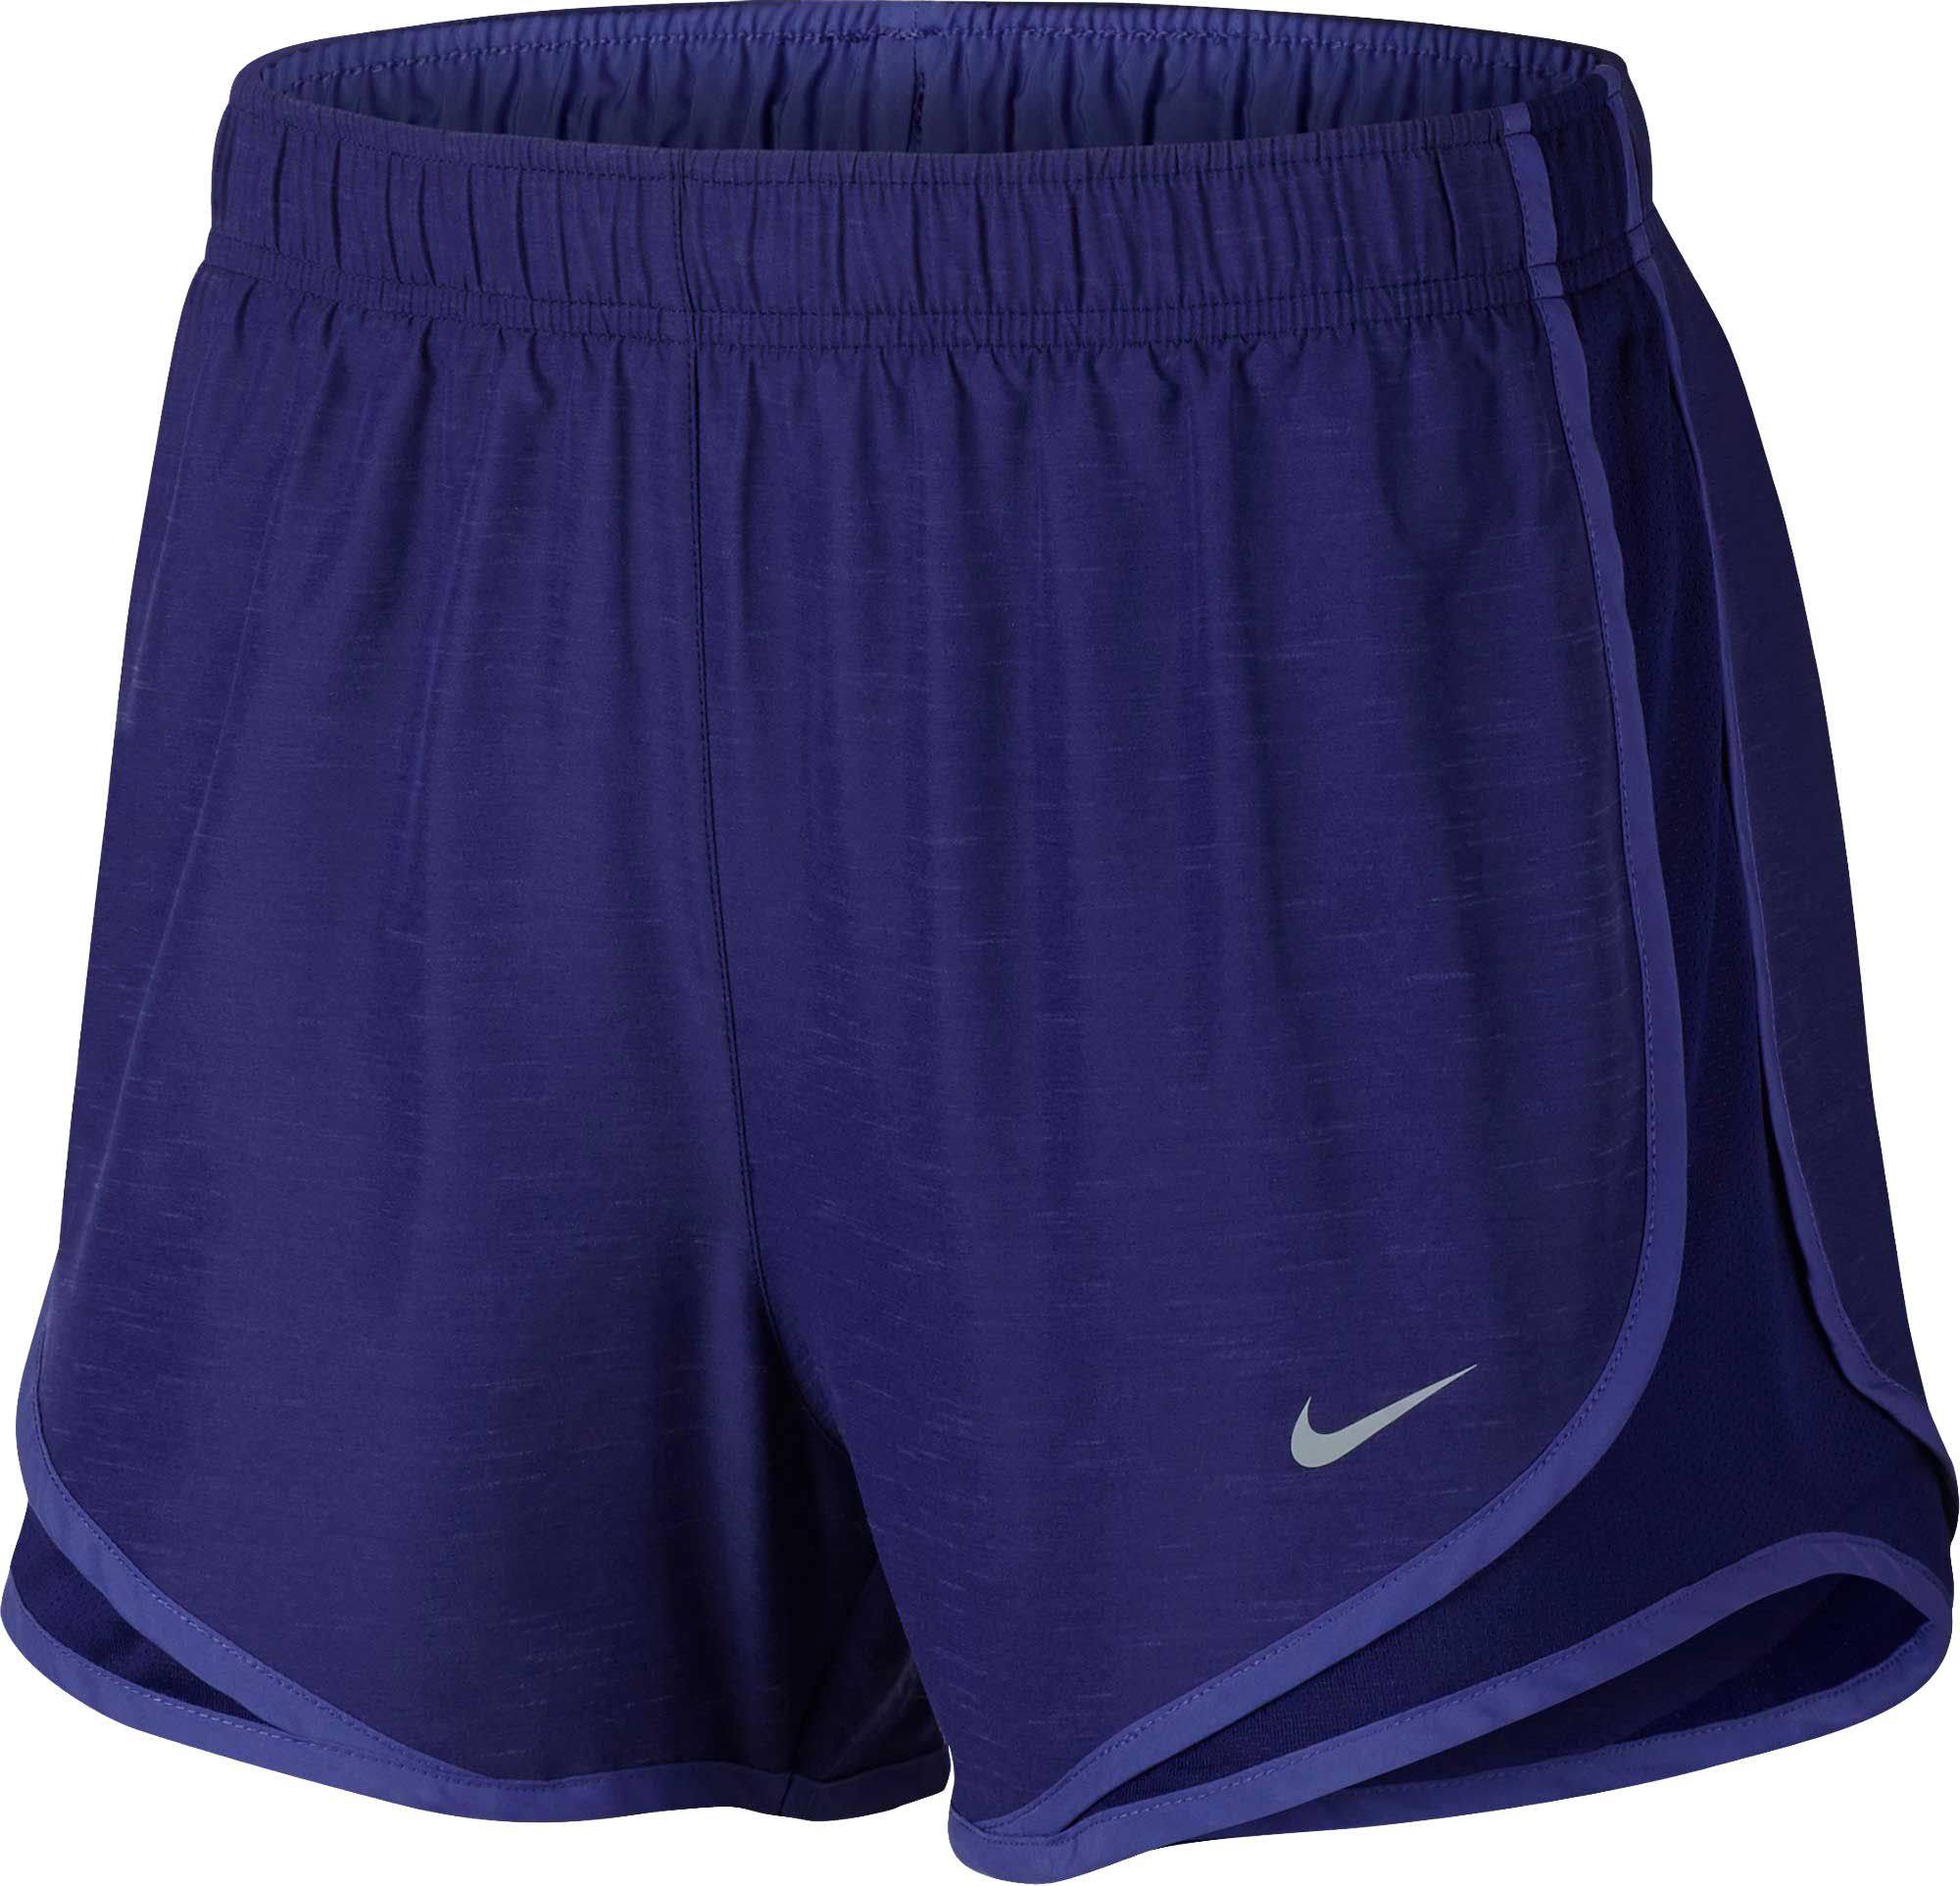 Dri Lila Xl Shorts fit Nike Running Tempo 7qdFww1